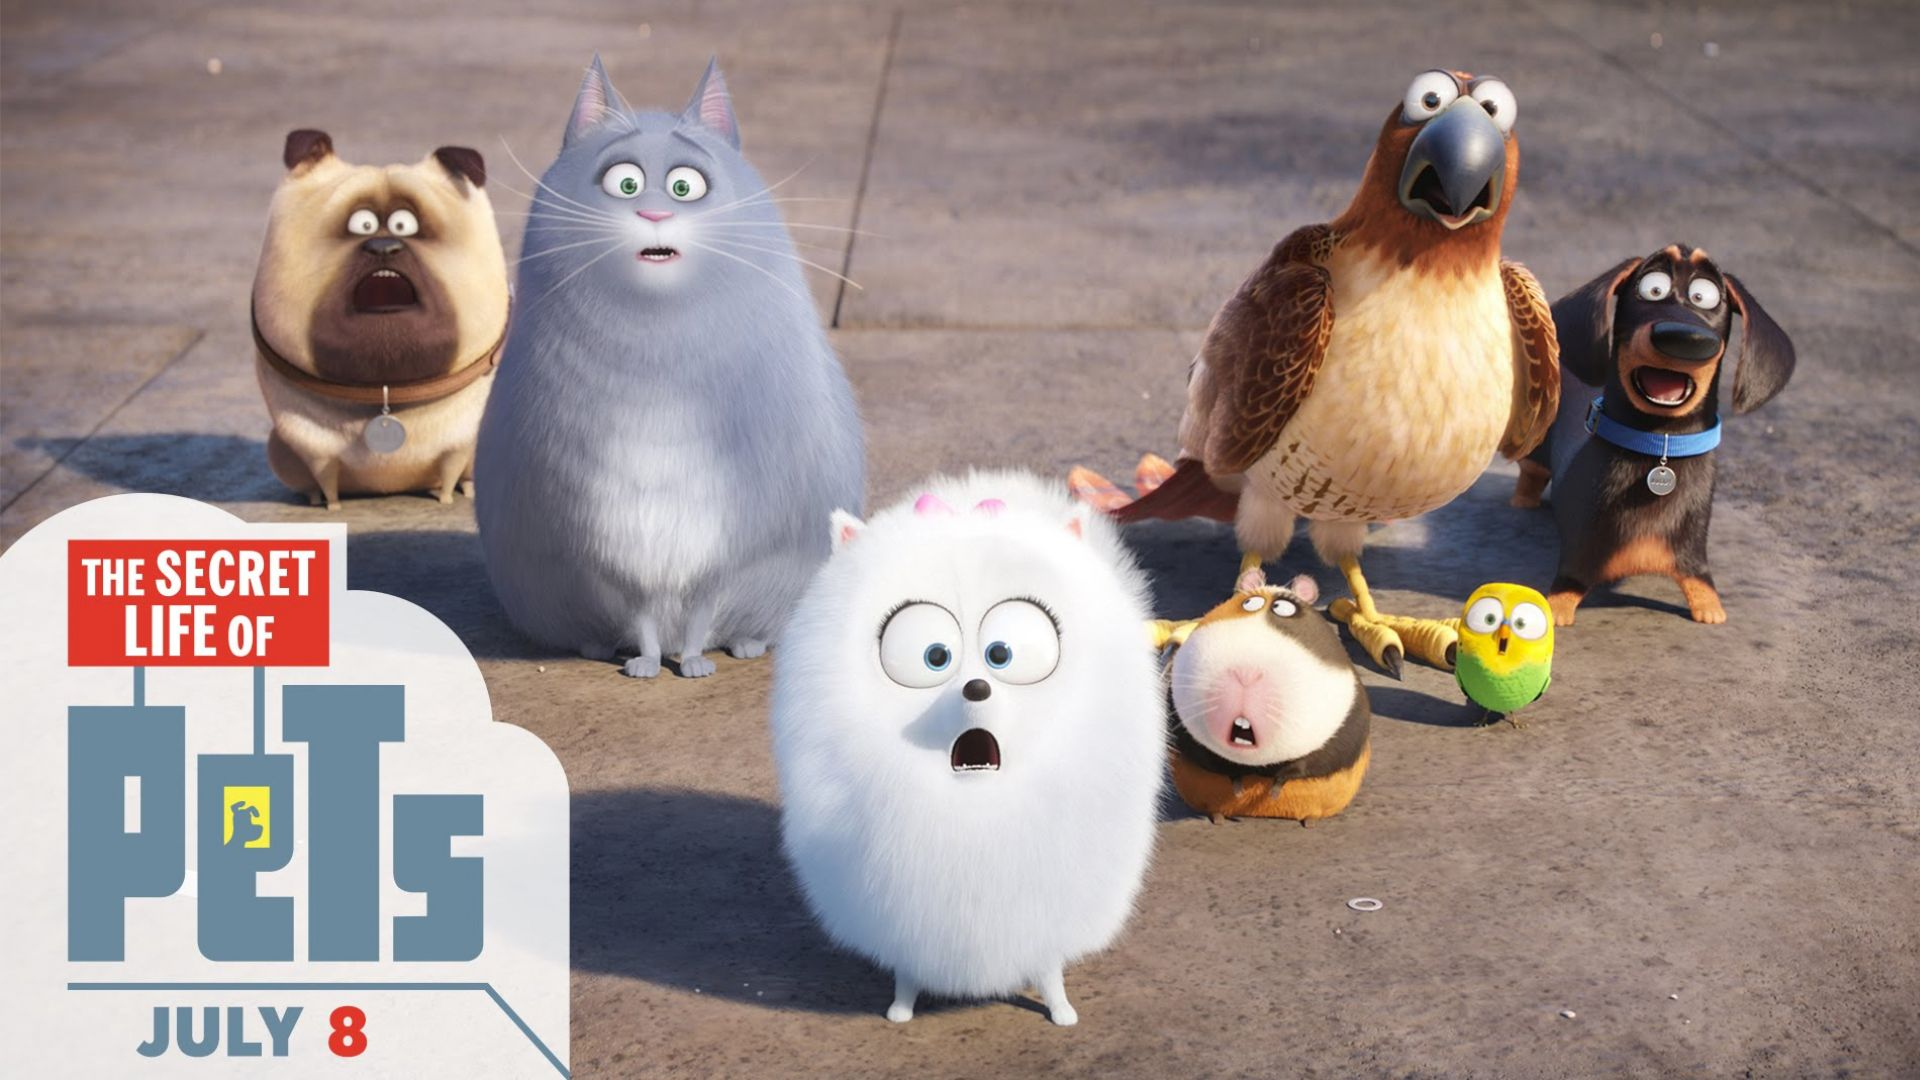 The Secret Life Of Pets - Trailer 2